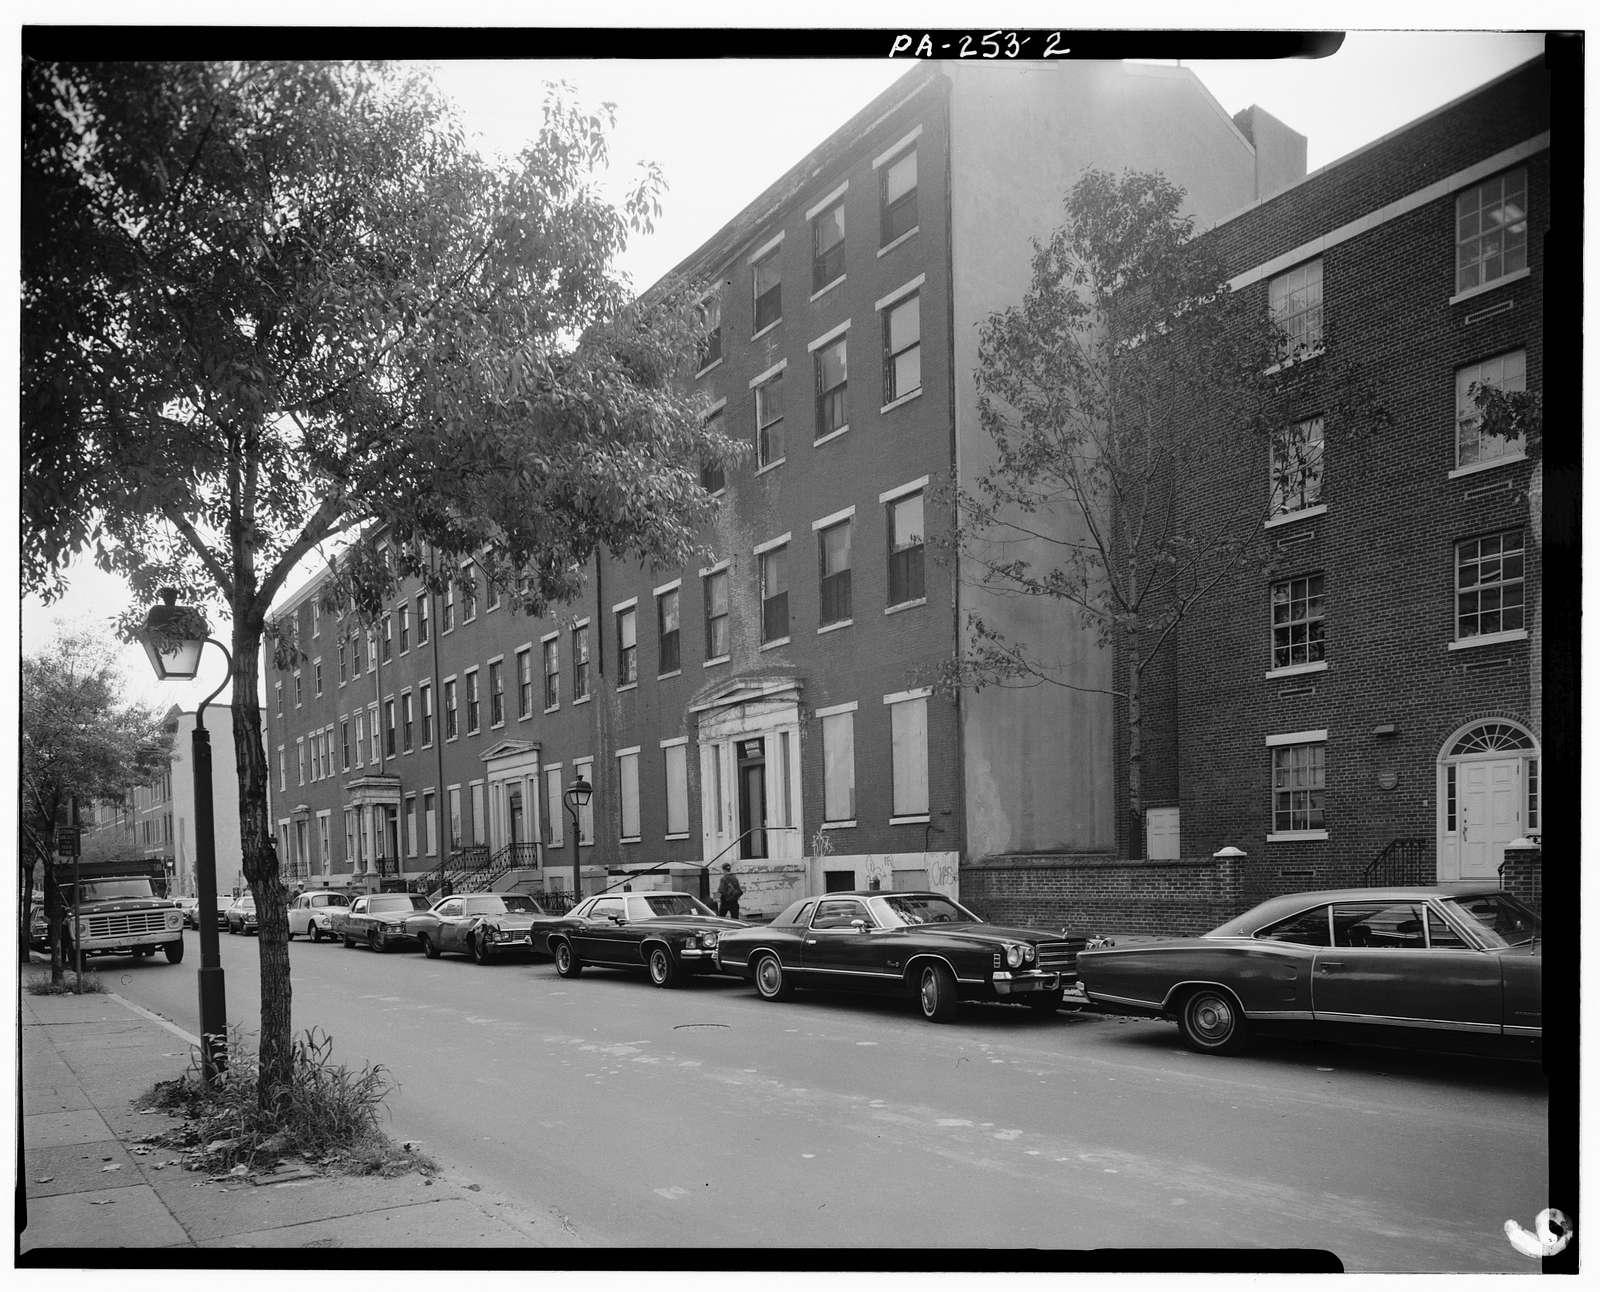 700-714 Spruce Street (Houses), Philadelphia, Philadelphia County, PA